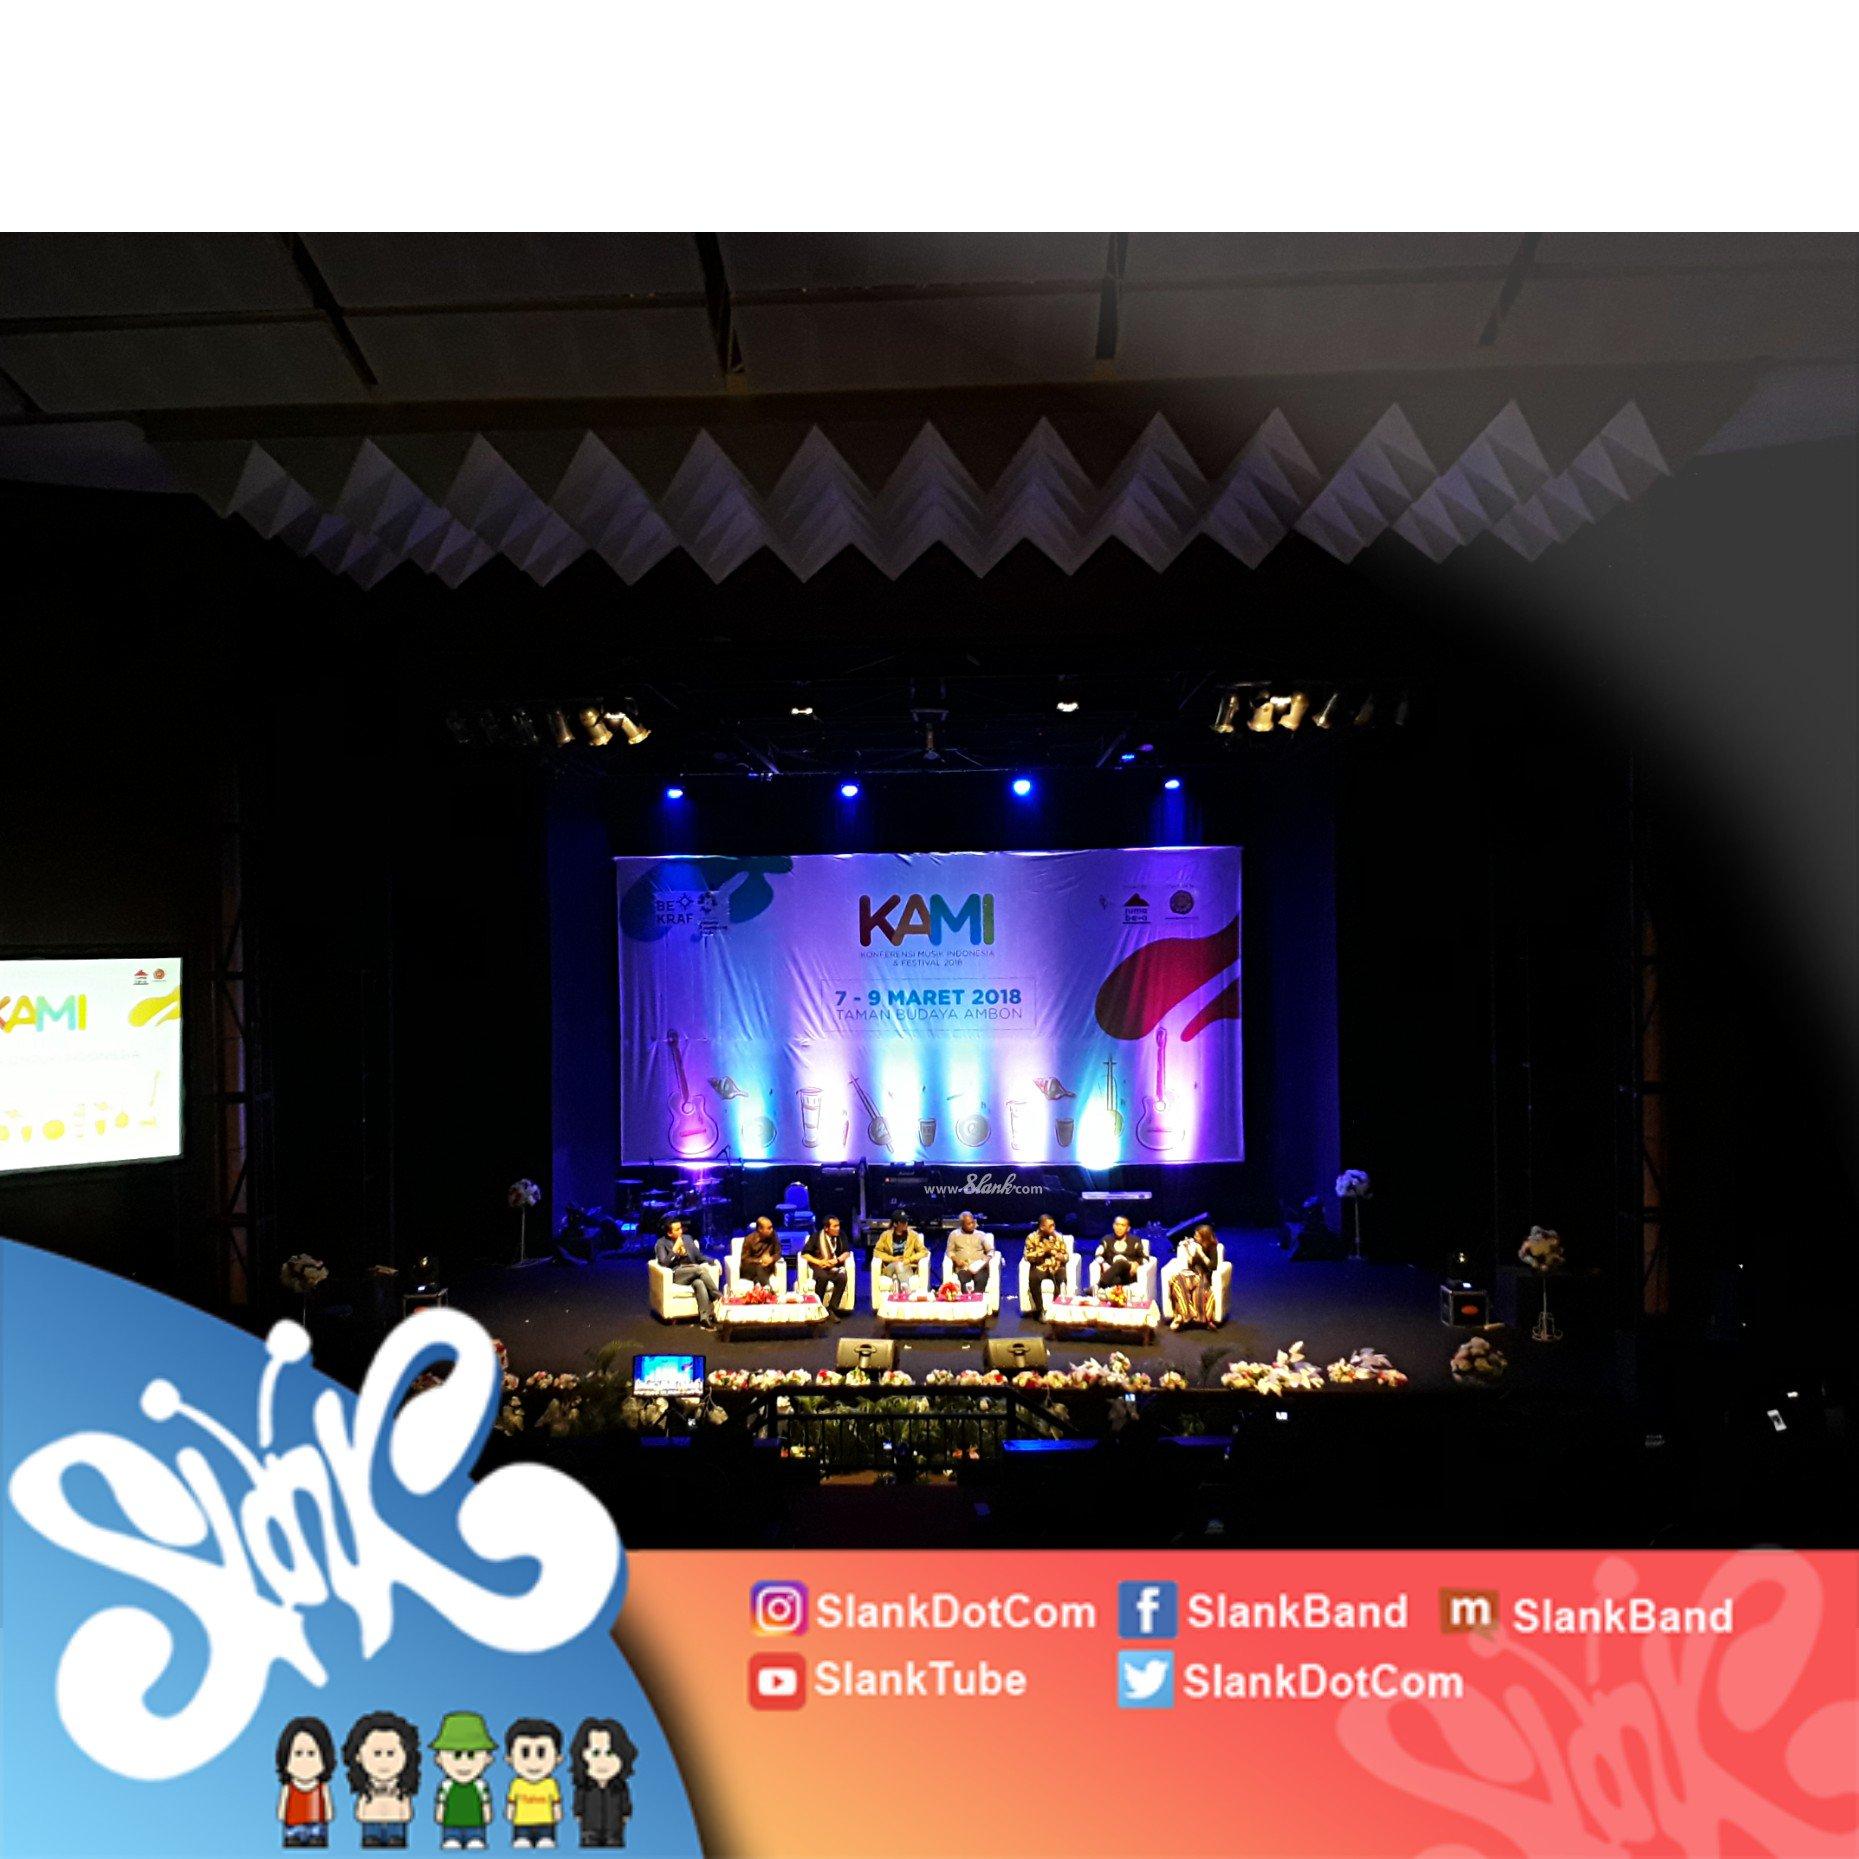 Pagi ini, Slank lebih dulu hadir di Konferensi Musik Indonesia & Festival 2018 sebelum #ngeSlankDiAmbon nanti malam! https://t.co/2zCl2VUwSN